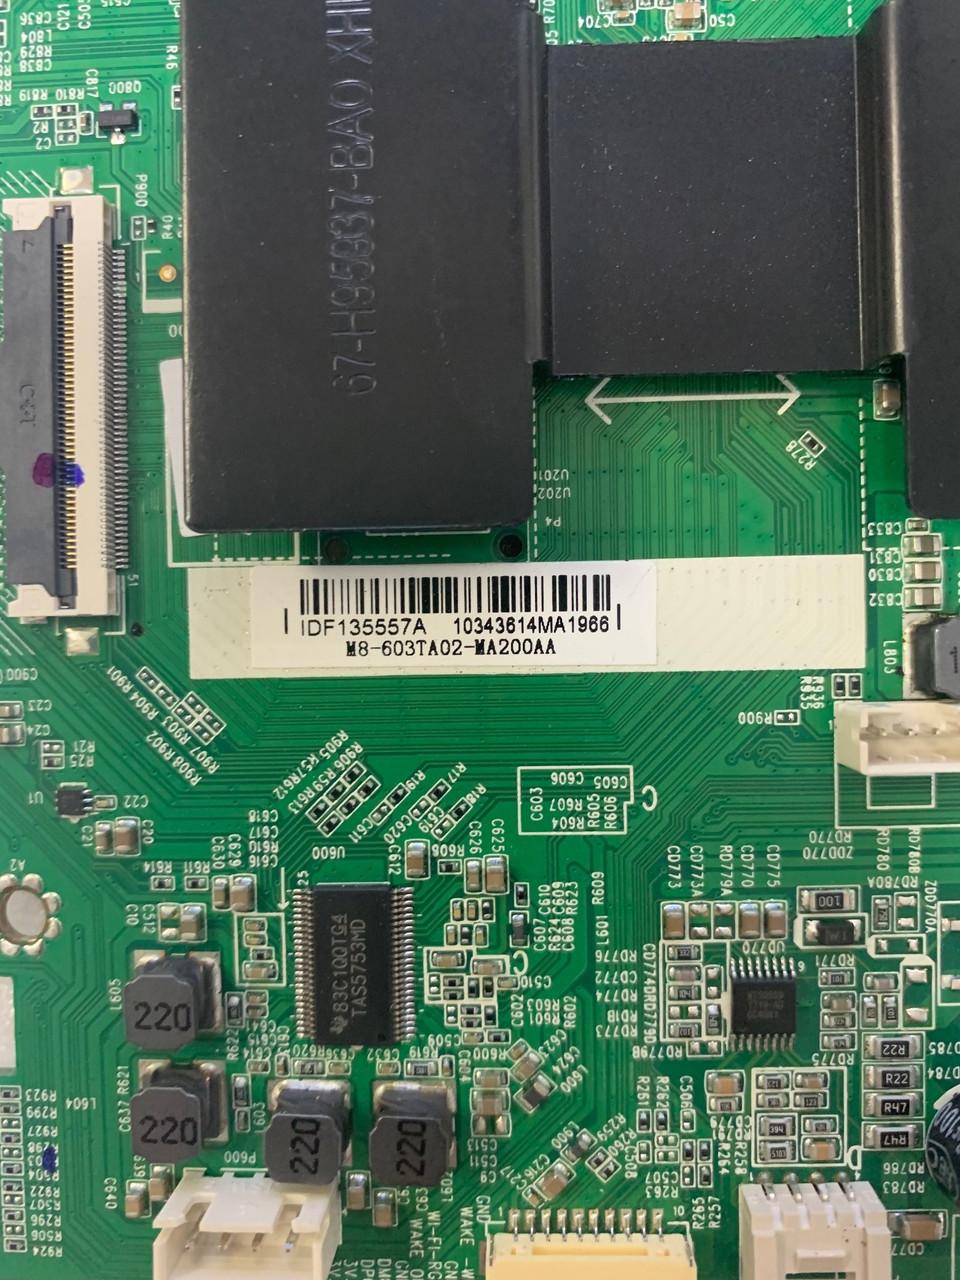 Hitachi 43R51 Main board 40-MT14A3-MAE2HG /  M8-603TA02-MA200AA